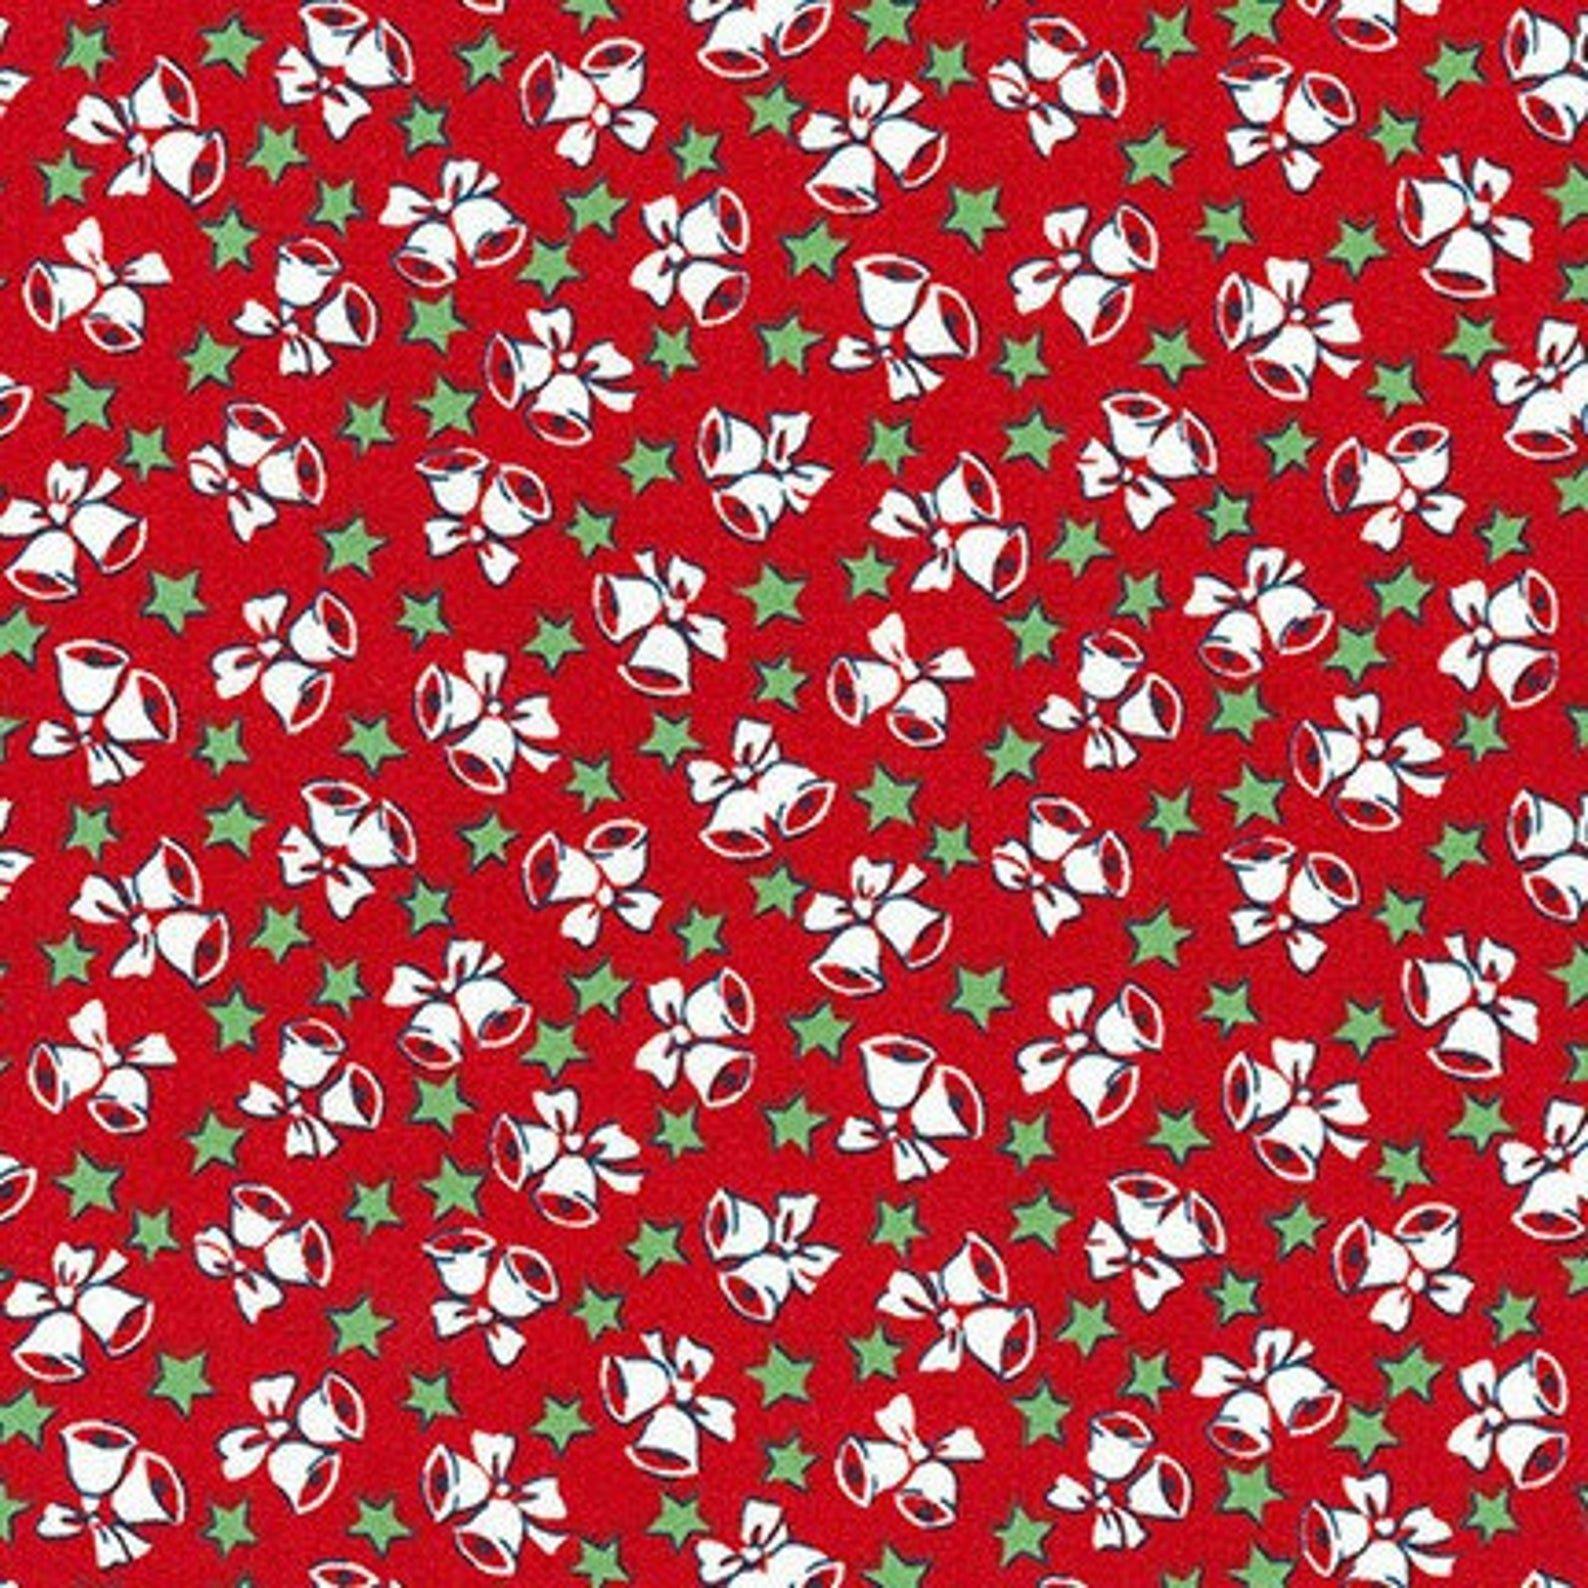 Yuletide Bells Holiday Red by Darlene Zimmerman - Fat Quarter